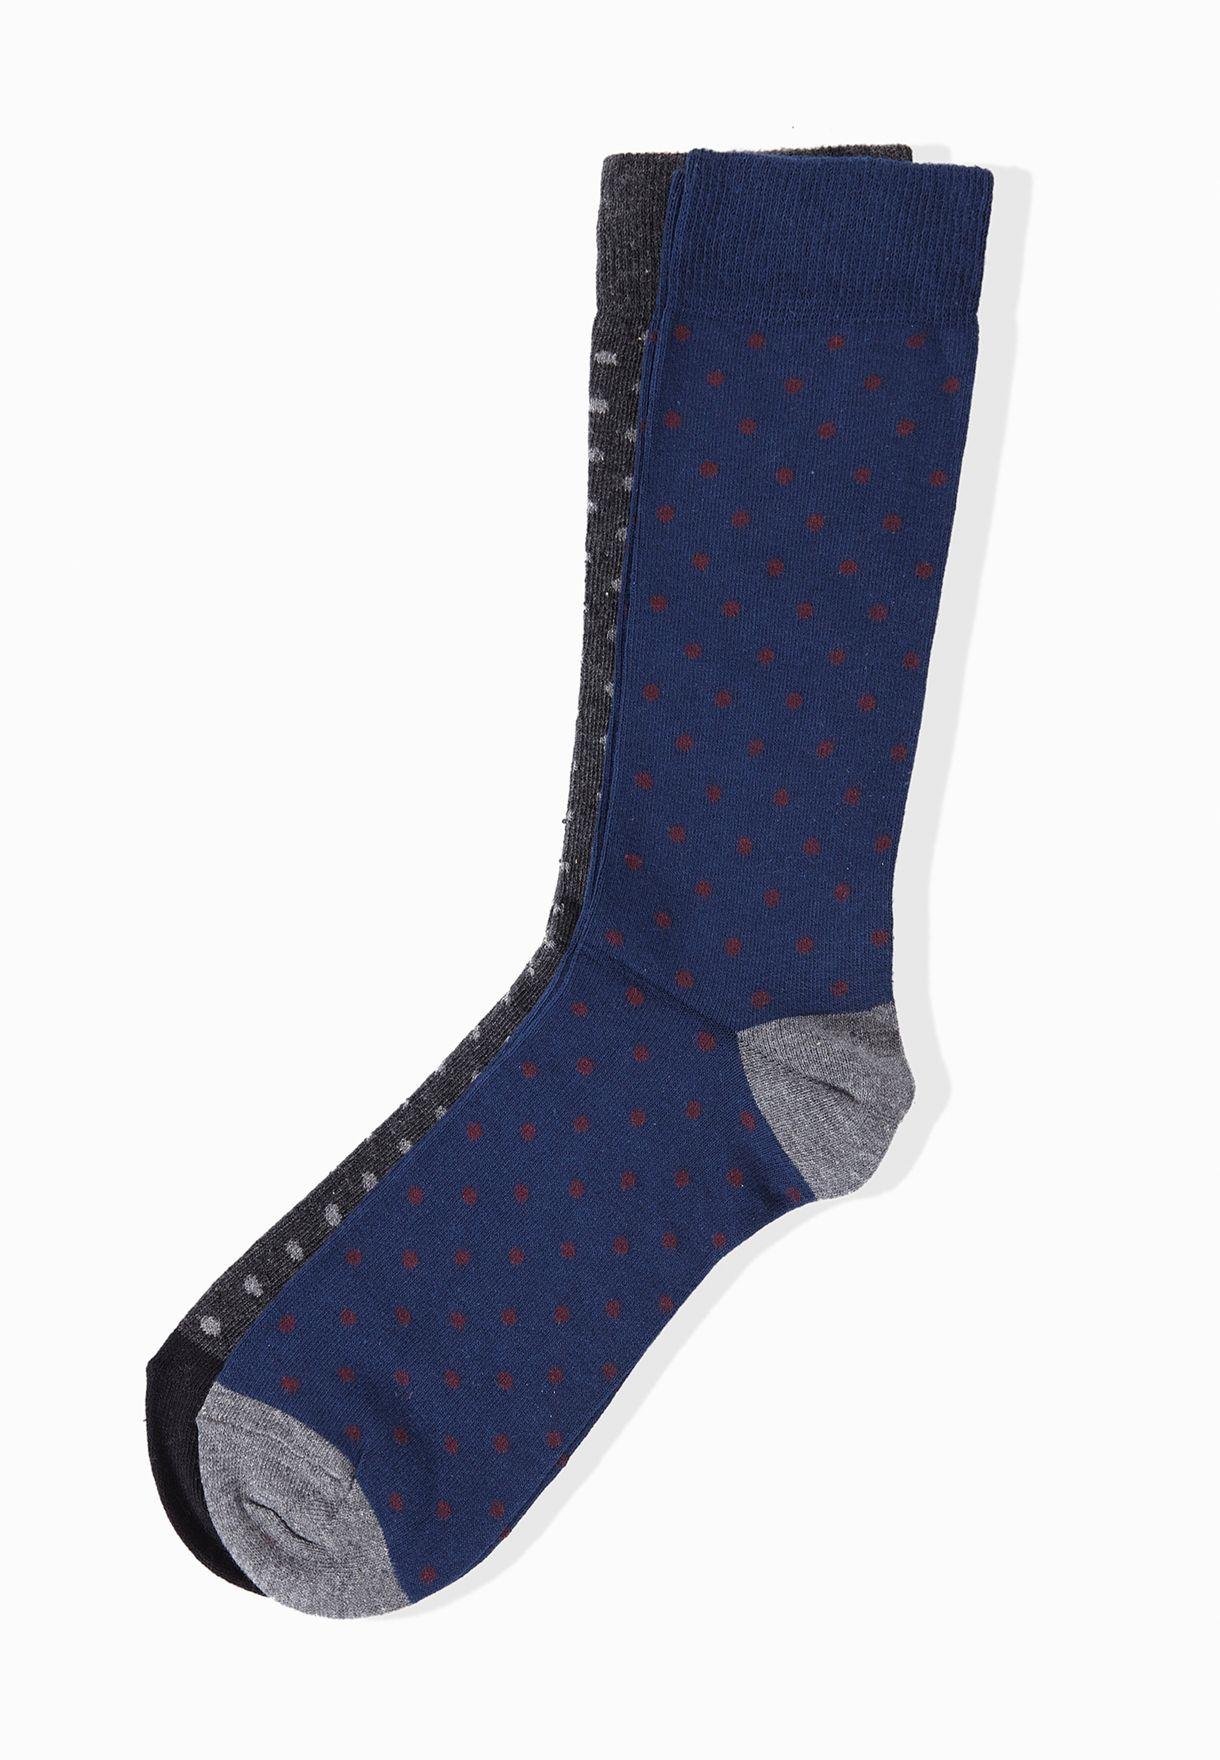 d7e03e24f1 Shop Mango Man grey 2 Pack Printed Socks 53030287 for Men in Qatar -  MA887AT84JXB